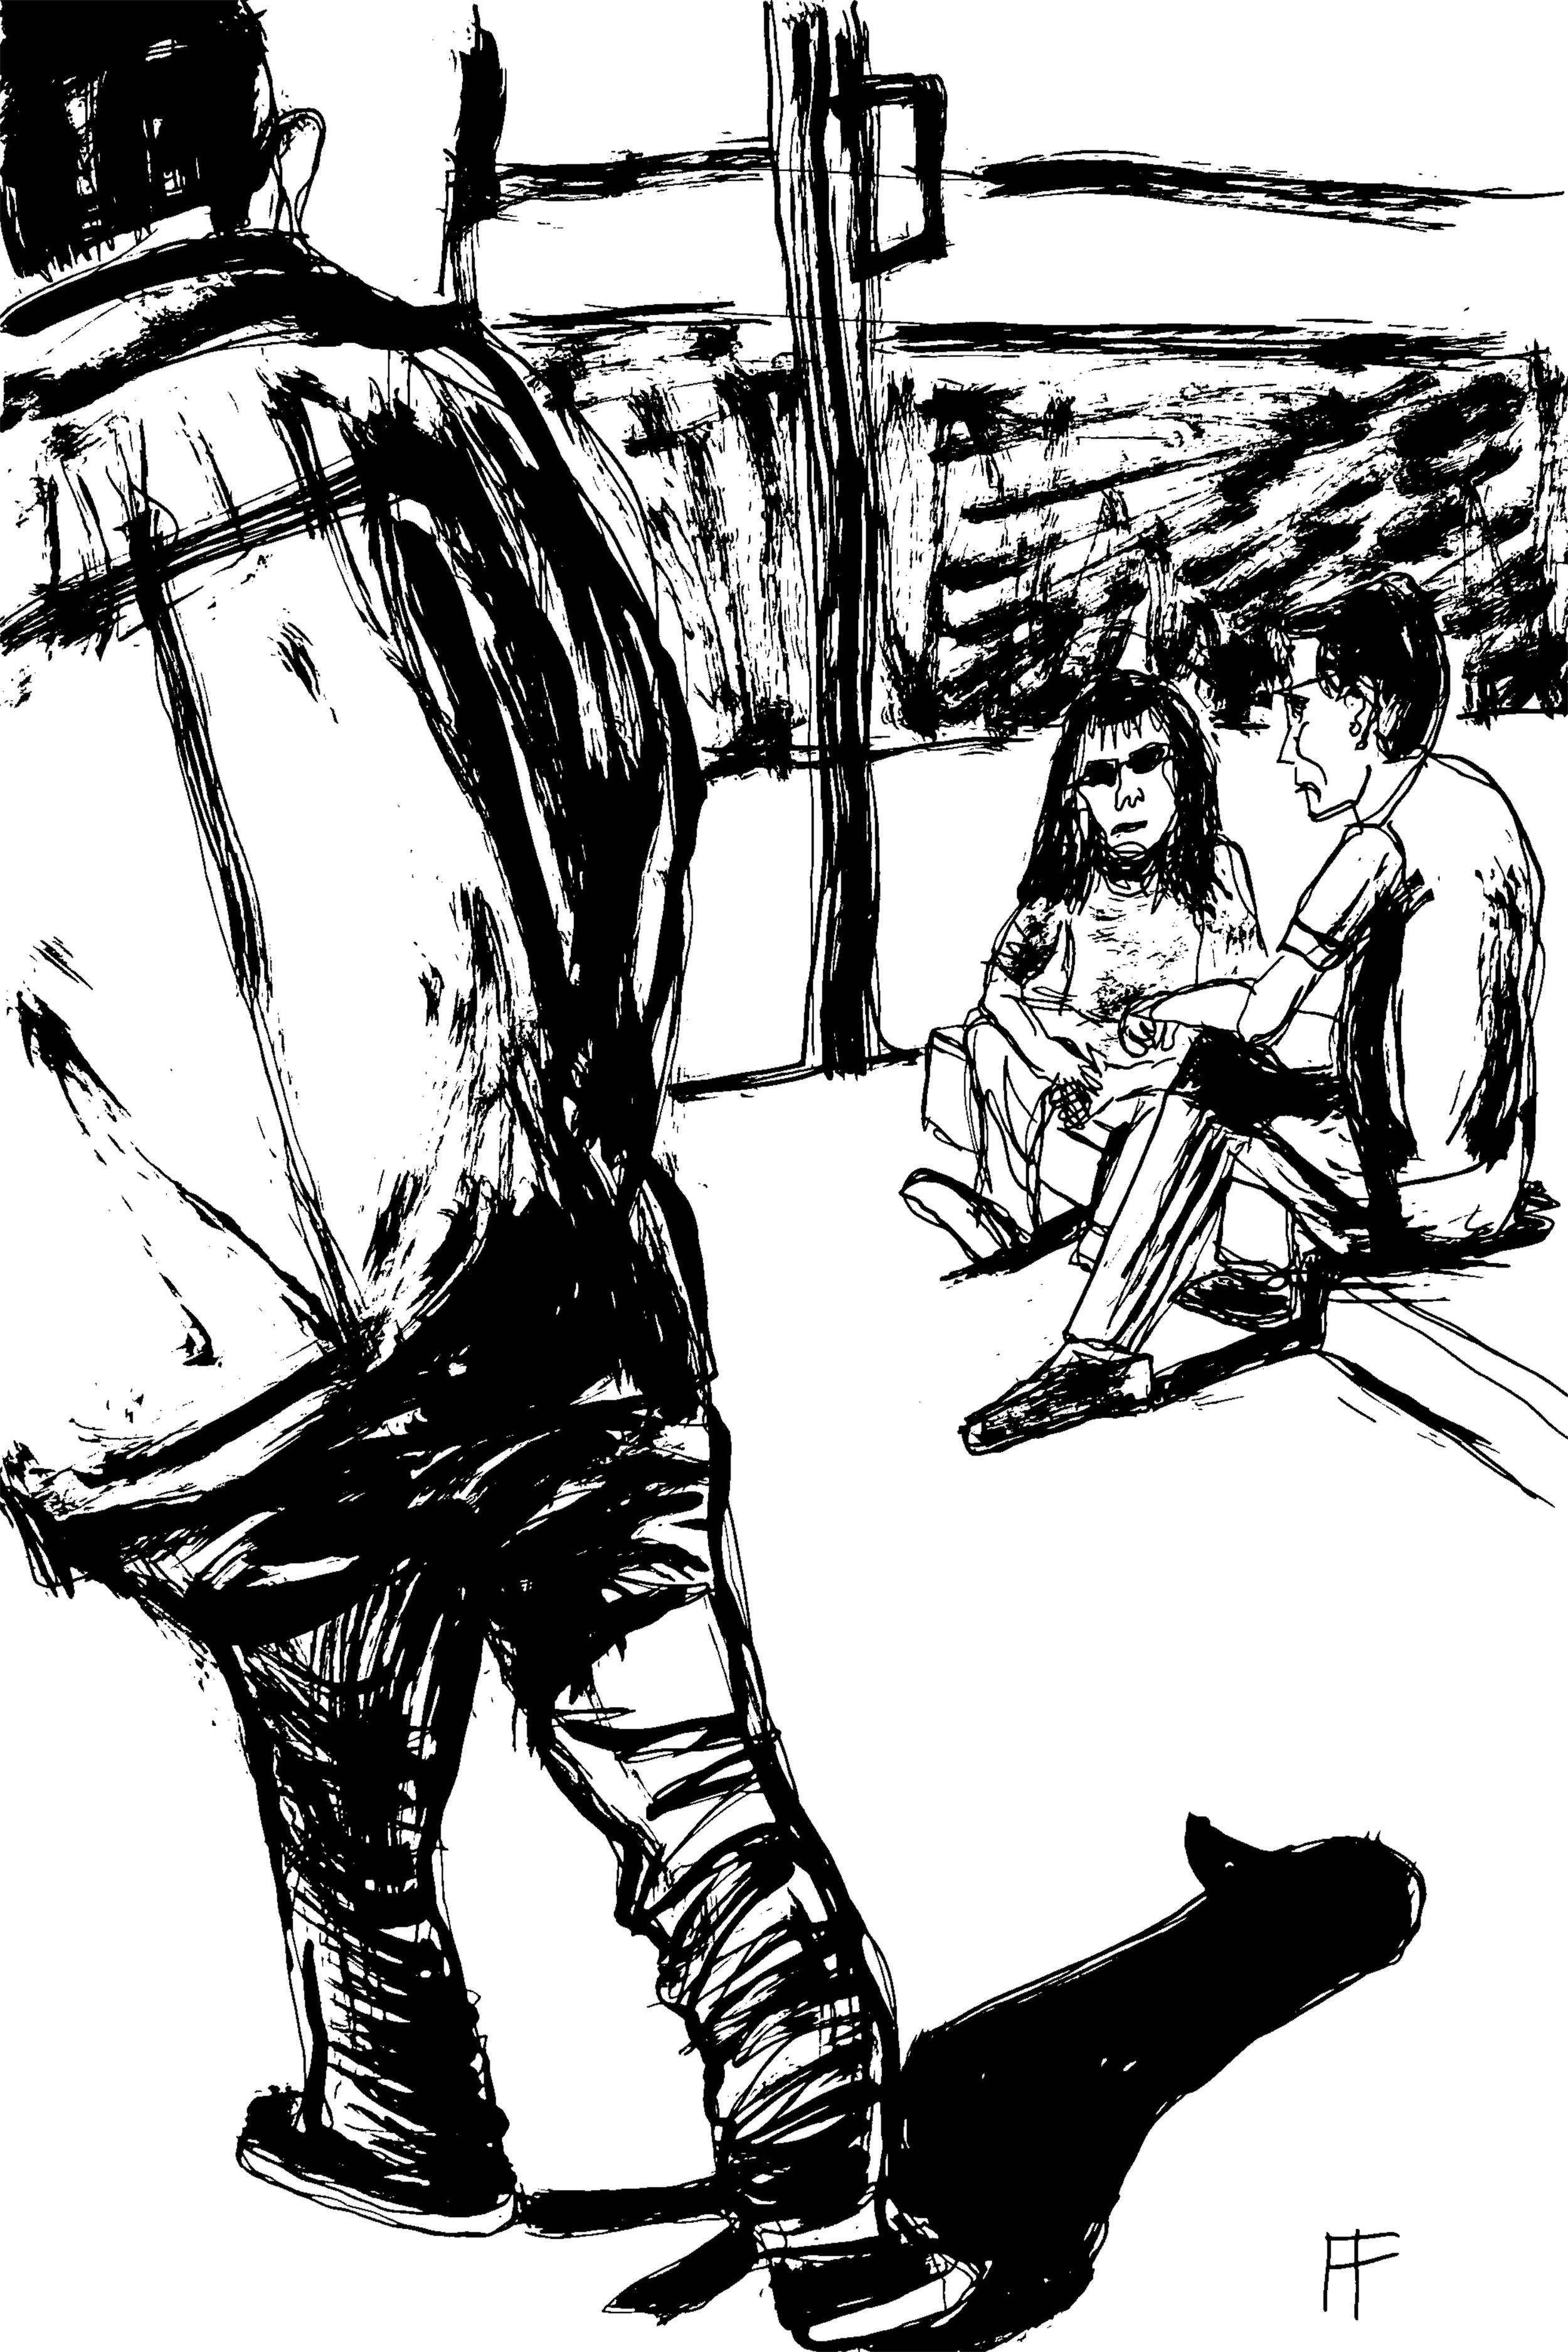 """Random Actors Walking and Waiting"" by  Allen Forrest"